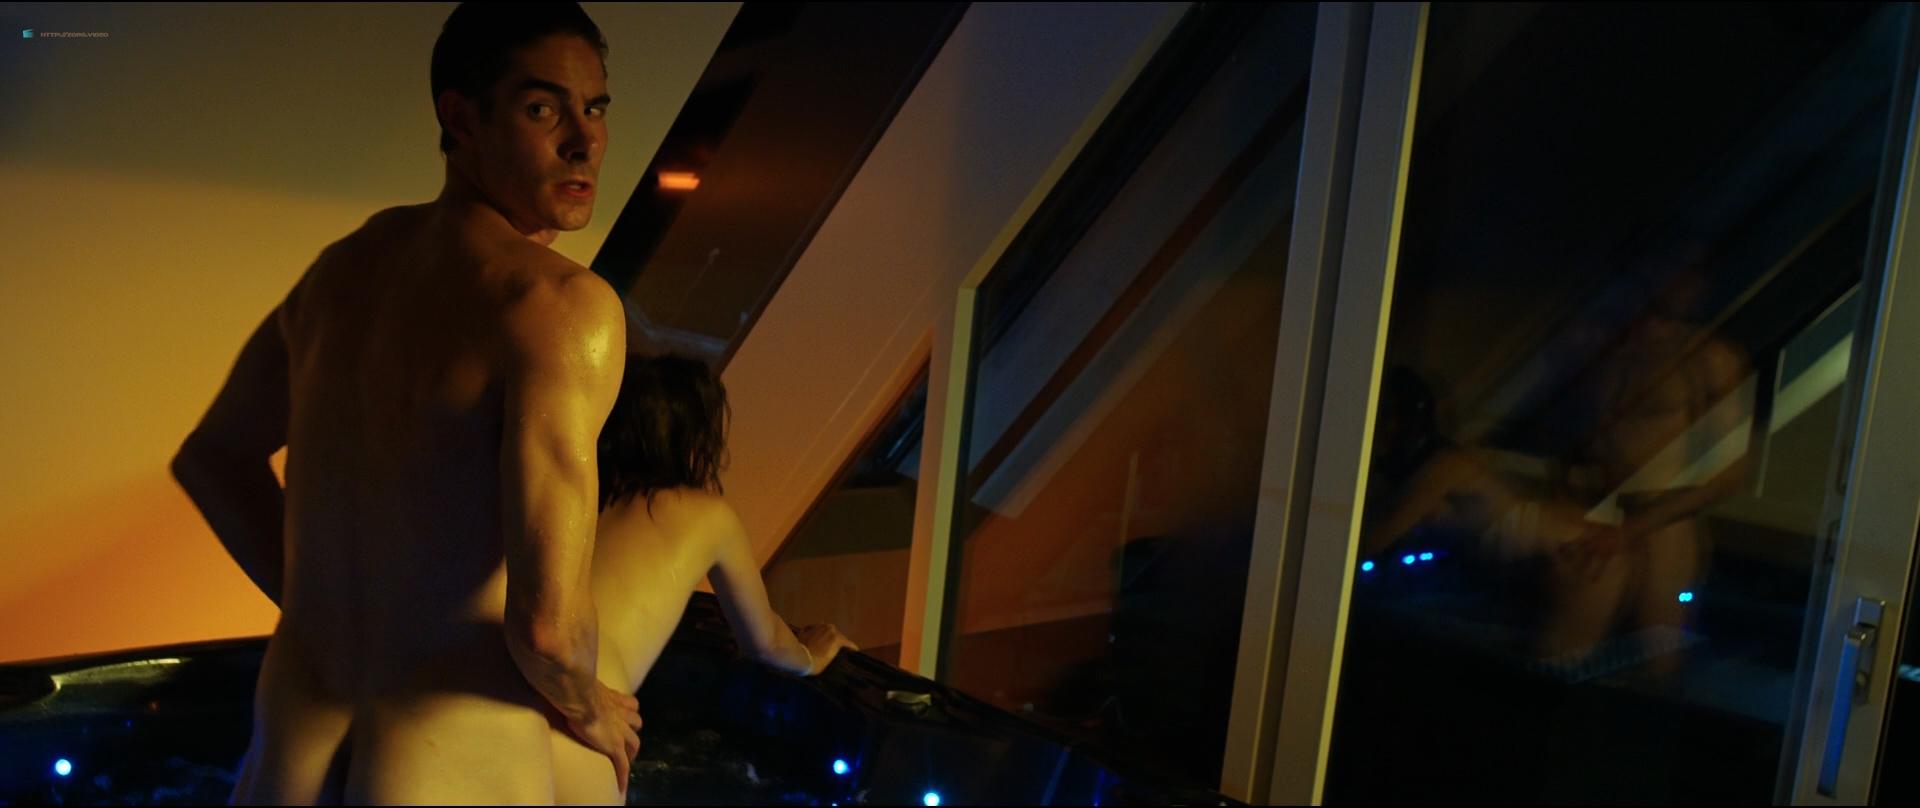 Holly Mae Brood hot and sexy Carolien Spoor, Marly van der Velden nude sex - Sneekweek (NL-2016) HD 1080p BluRay (10)